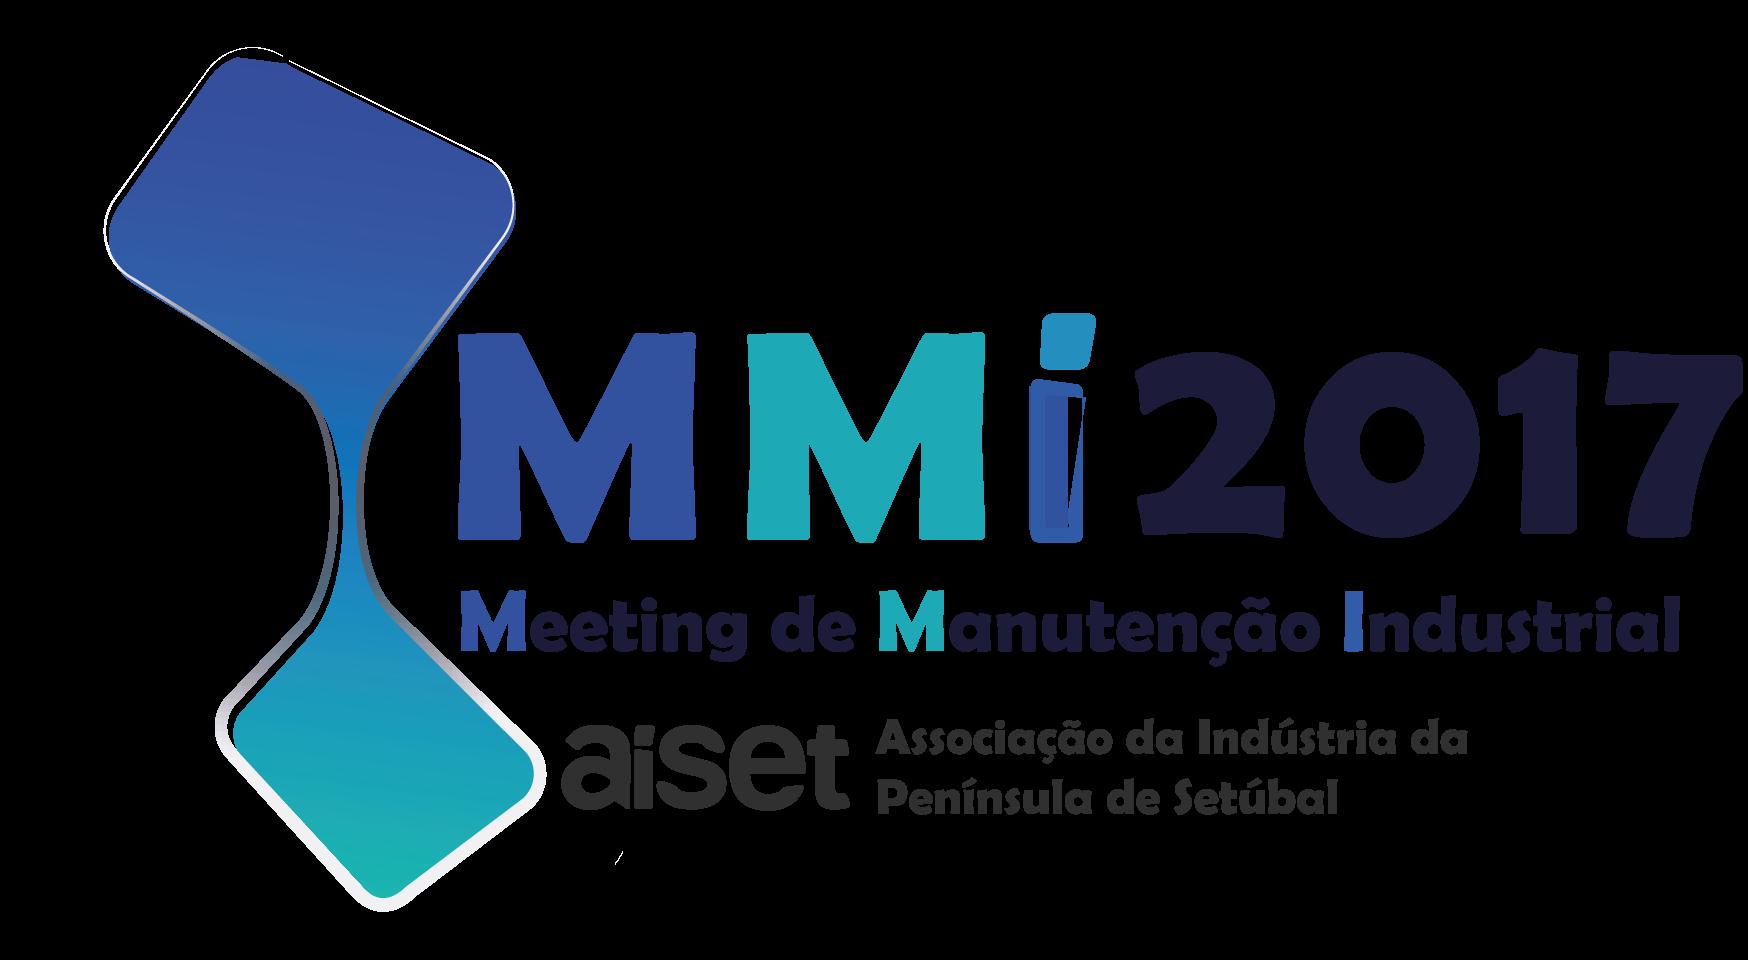 Meeting de Manutenção Industrial